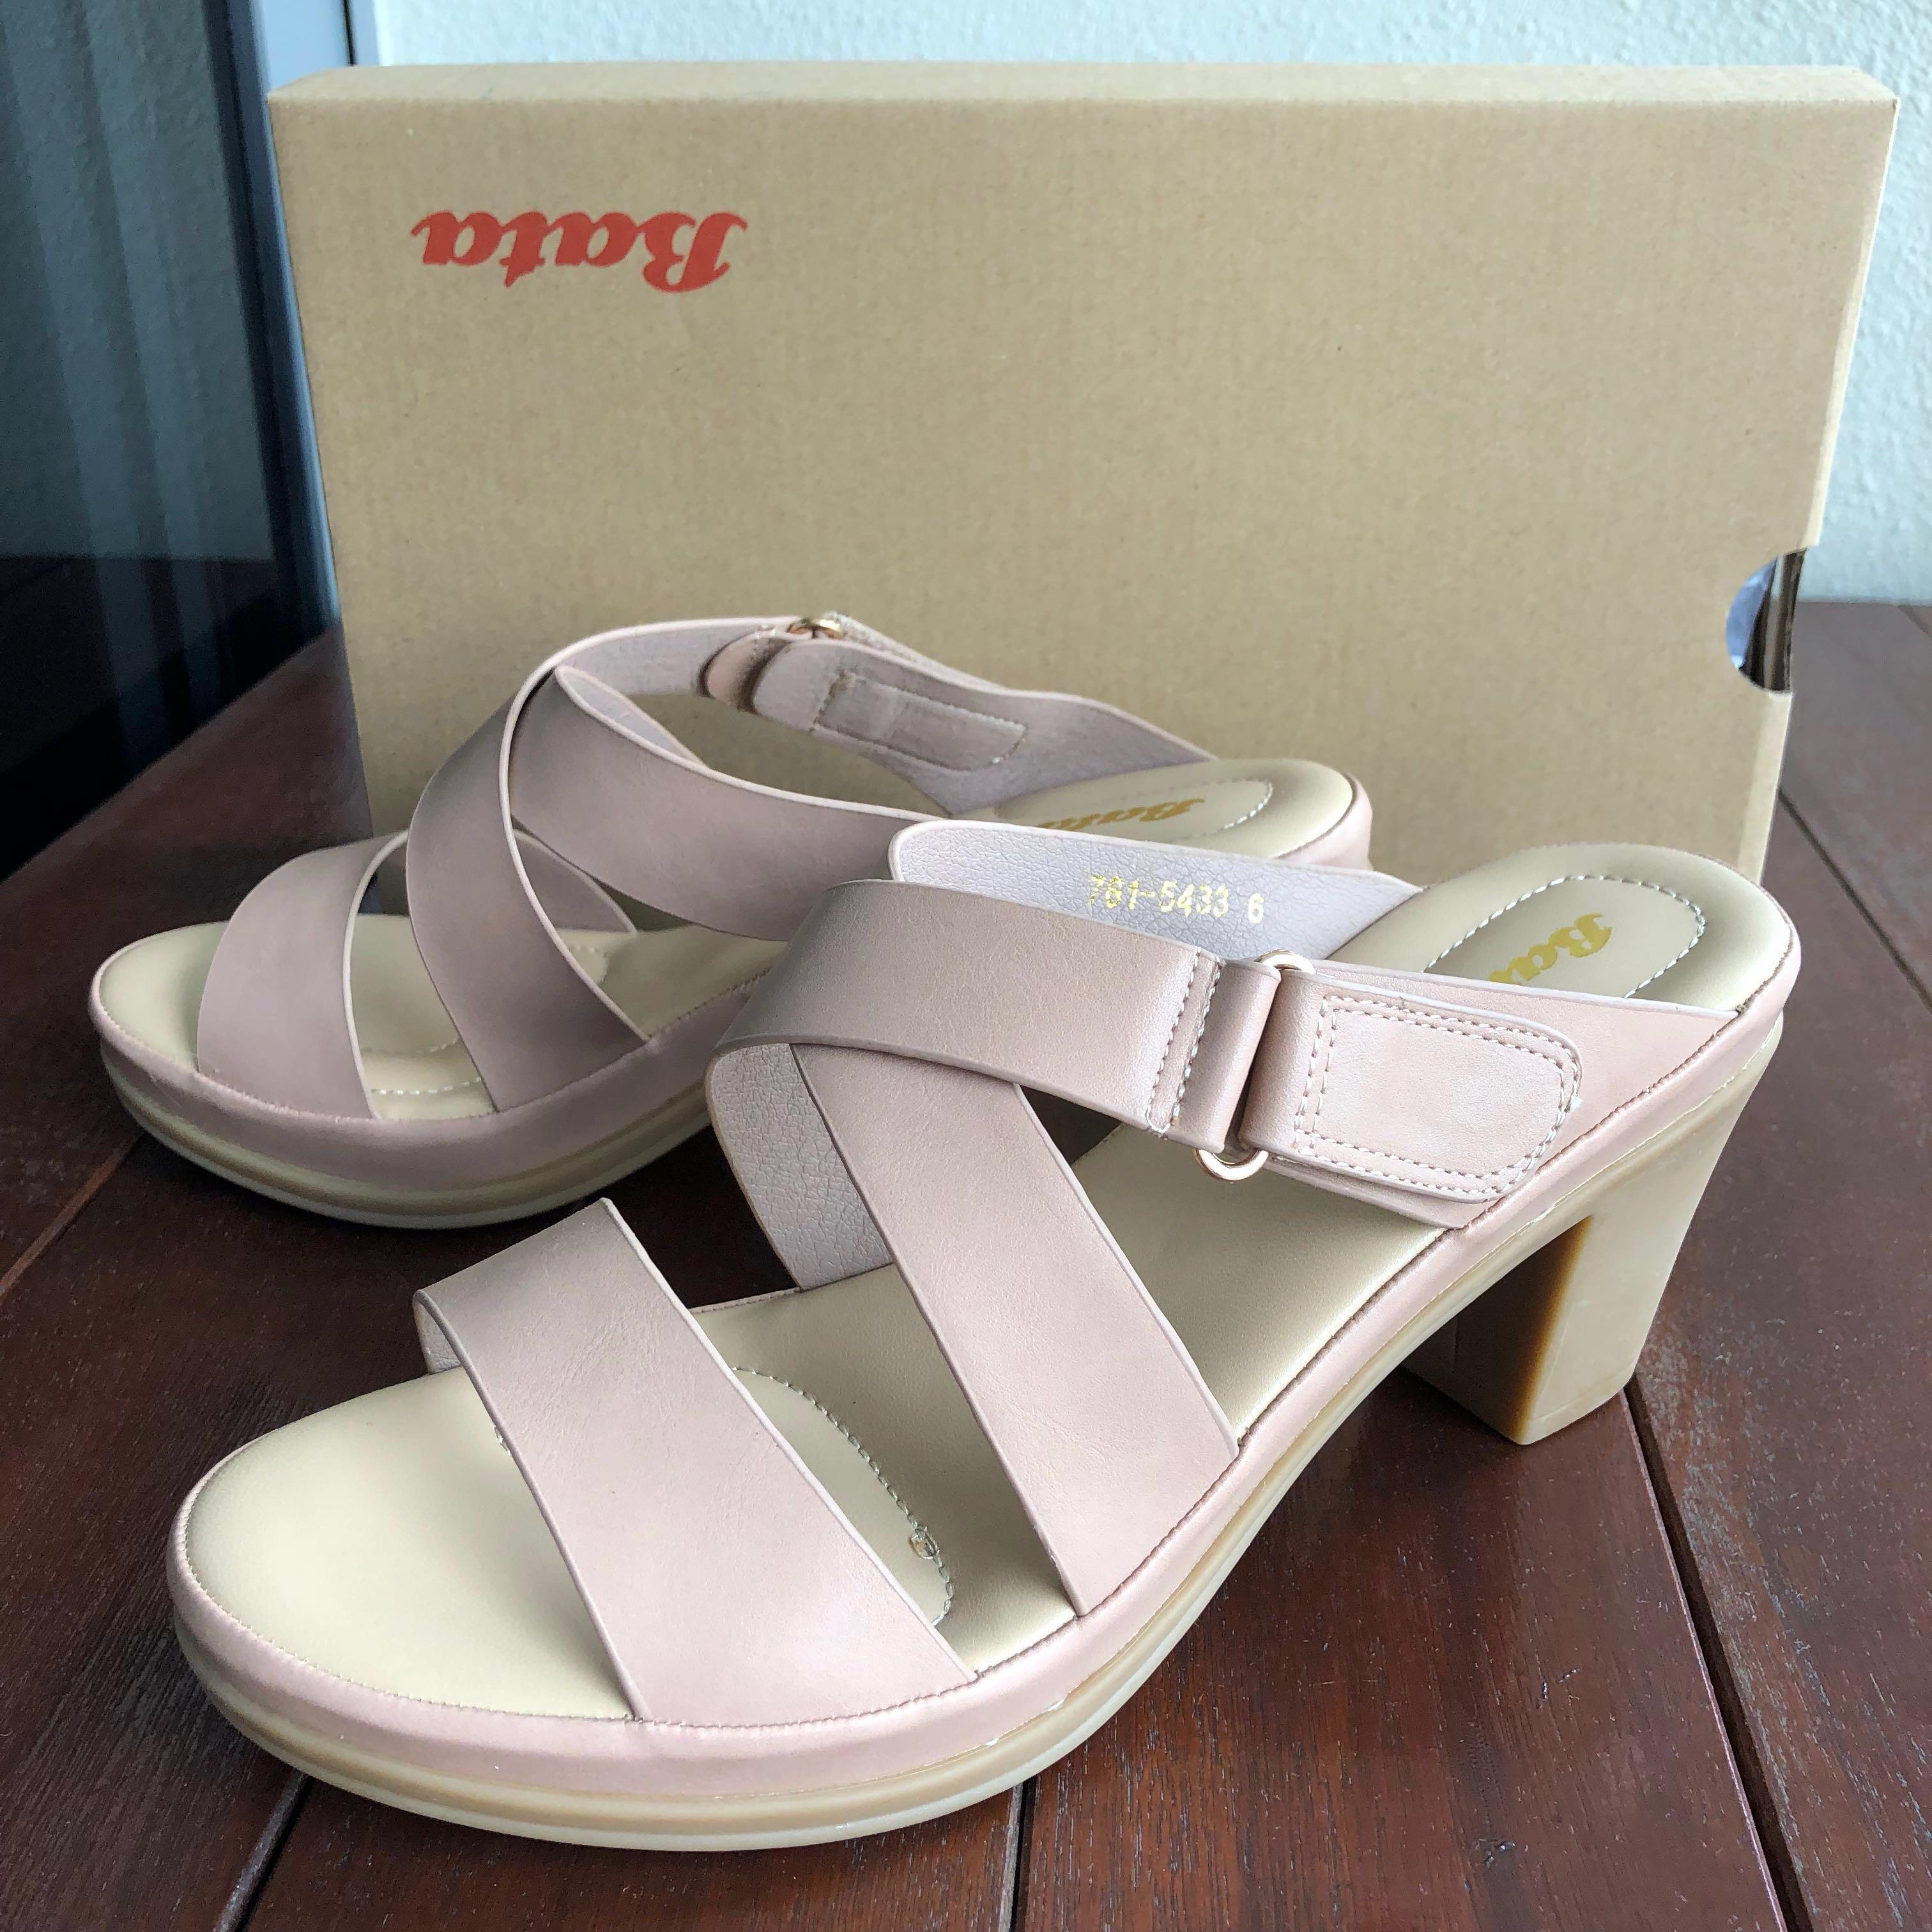 6c86b8995438 BN Bata Ladies Heels Sandals Blush